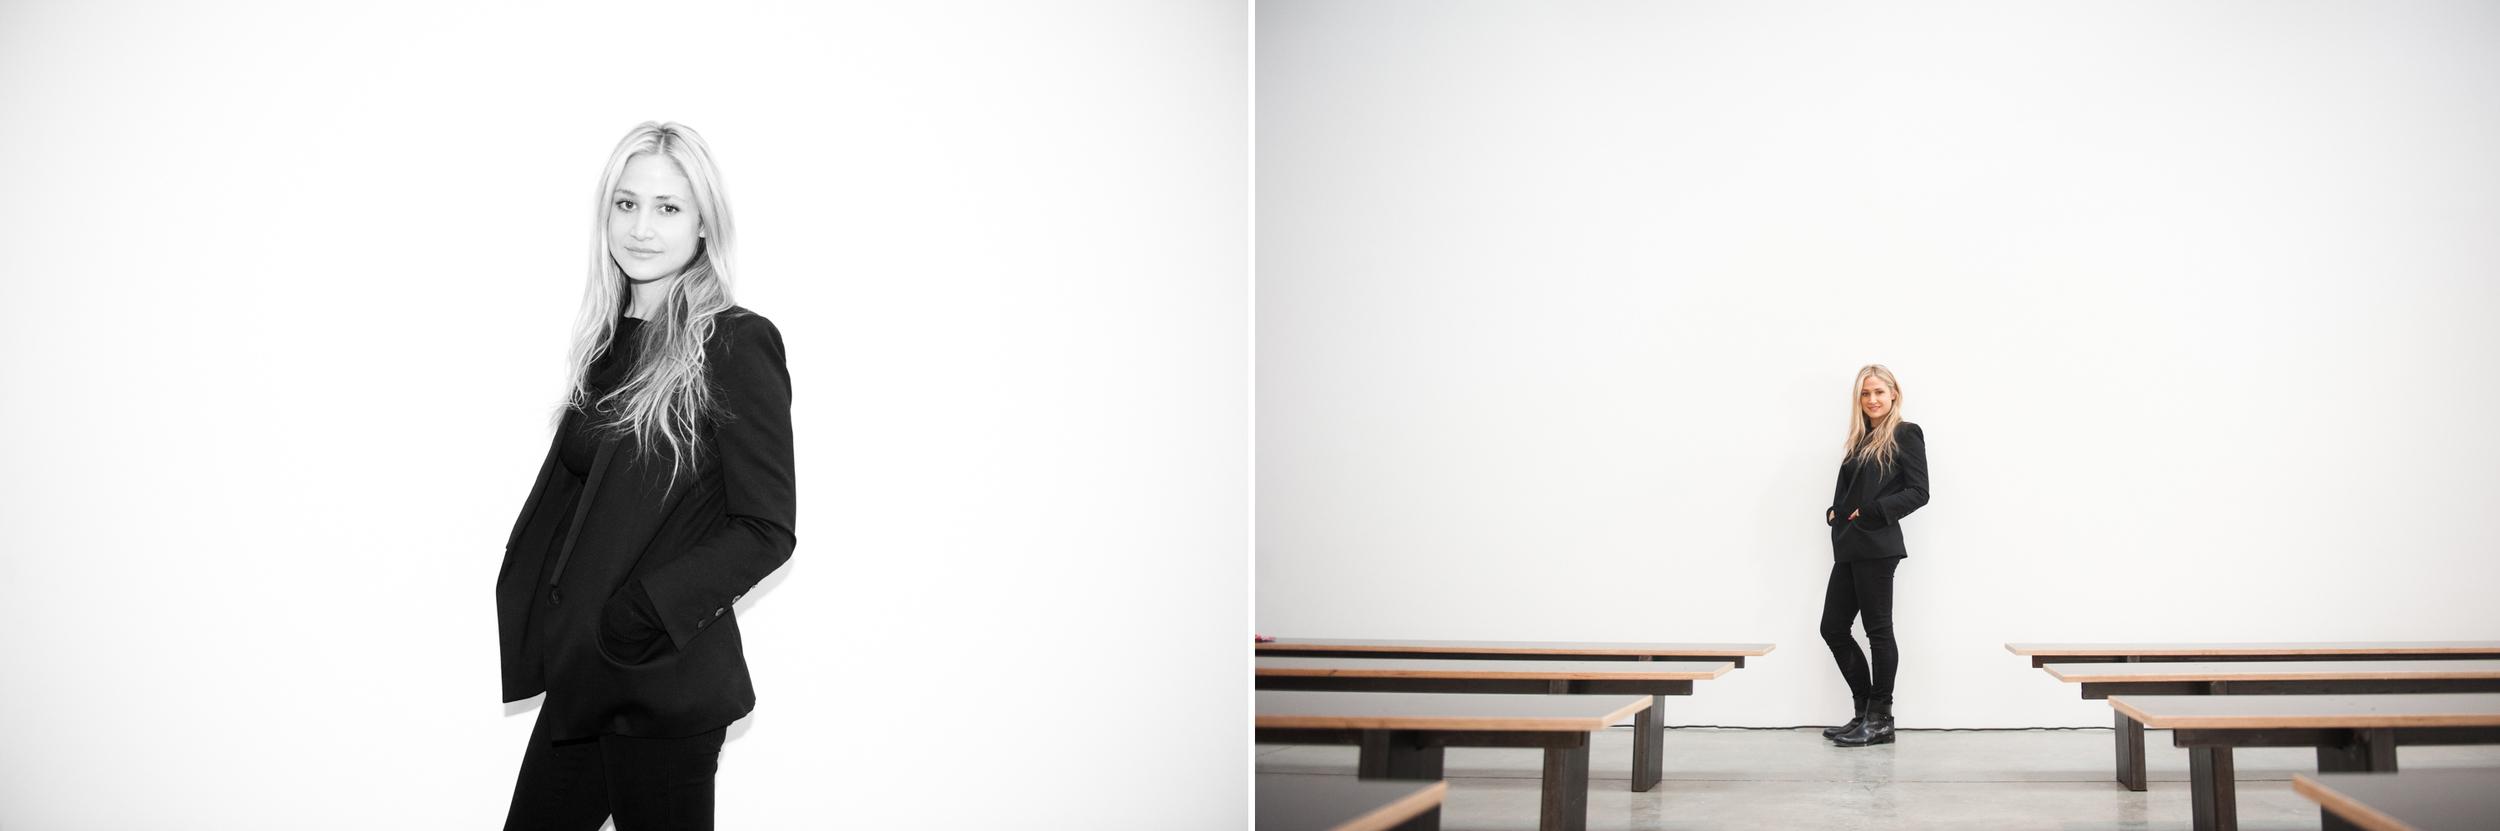 Kimberly Ovitz, Fashion Designer. Featured in Elle Magazine